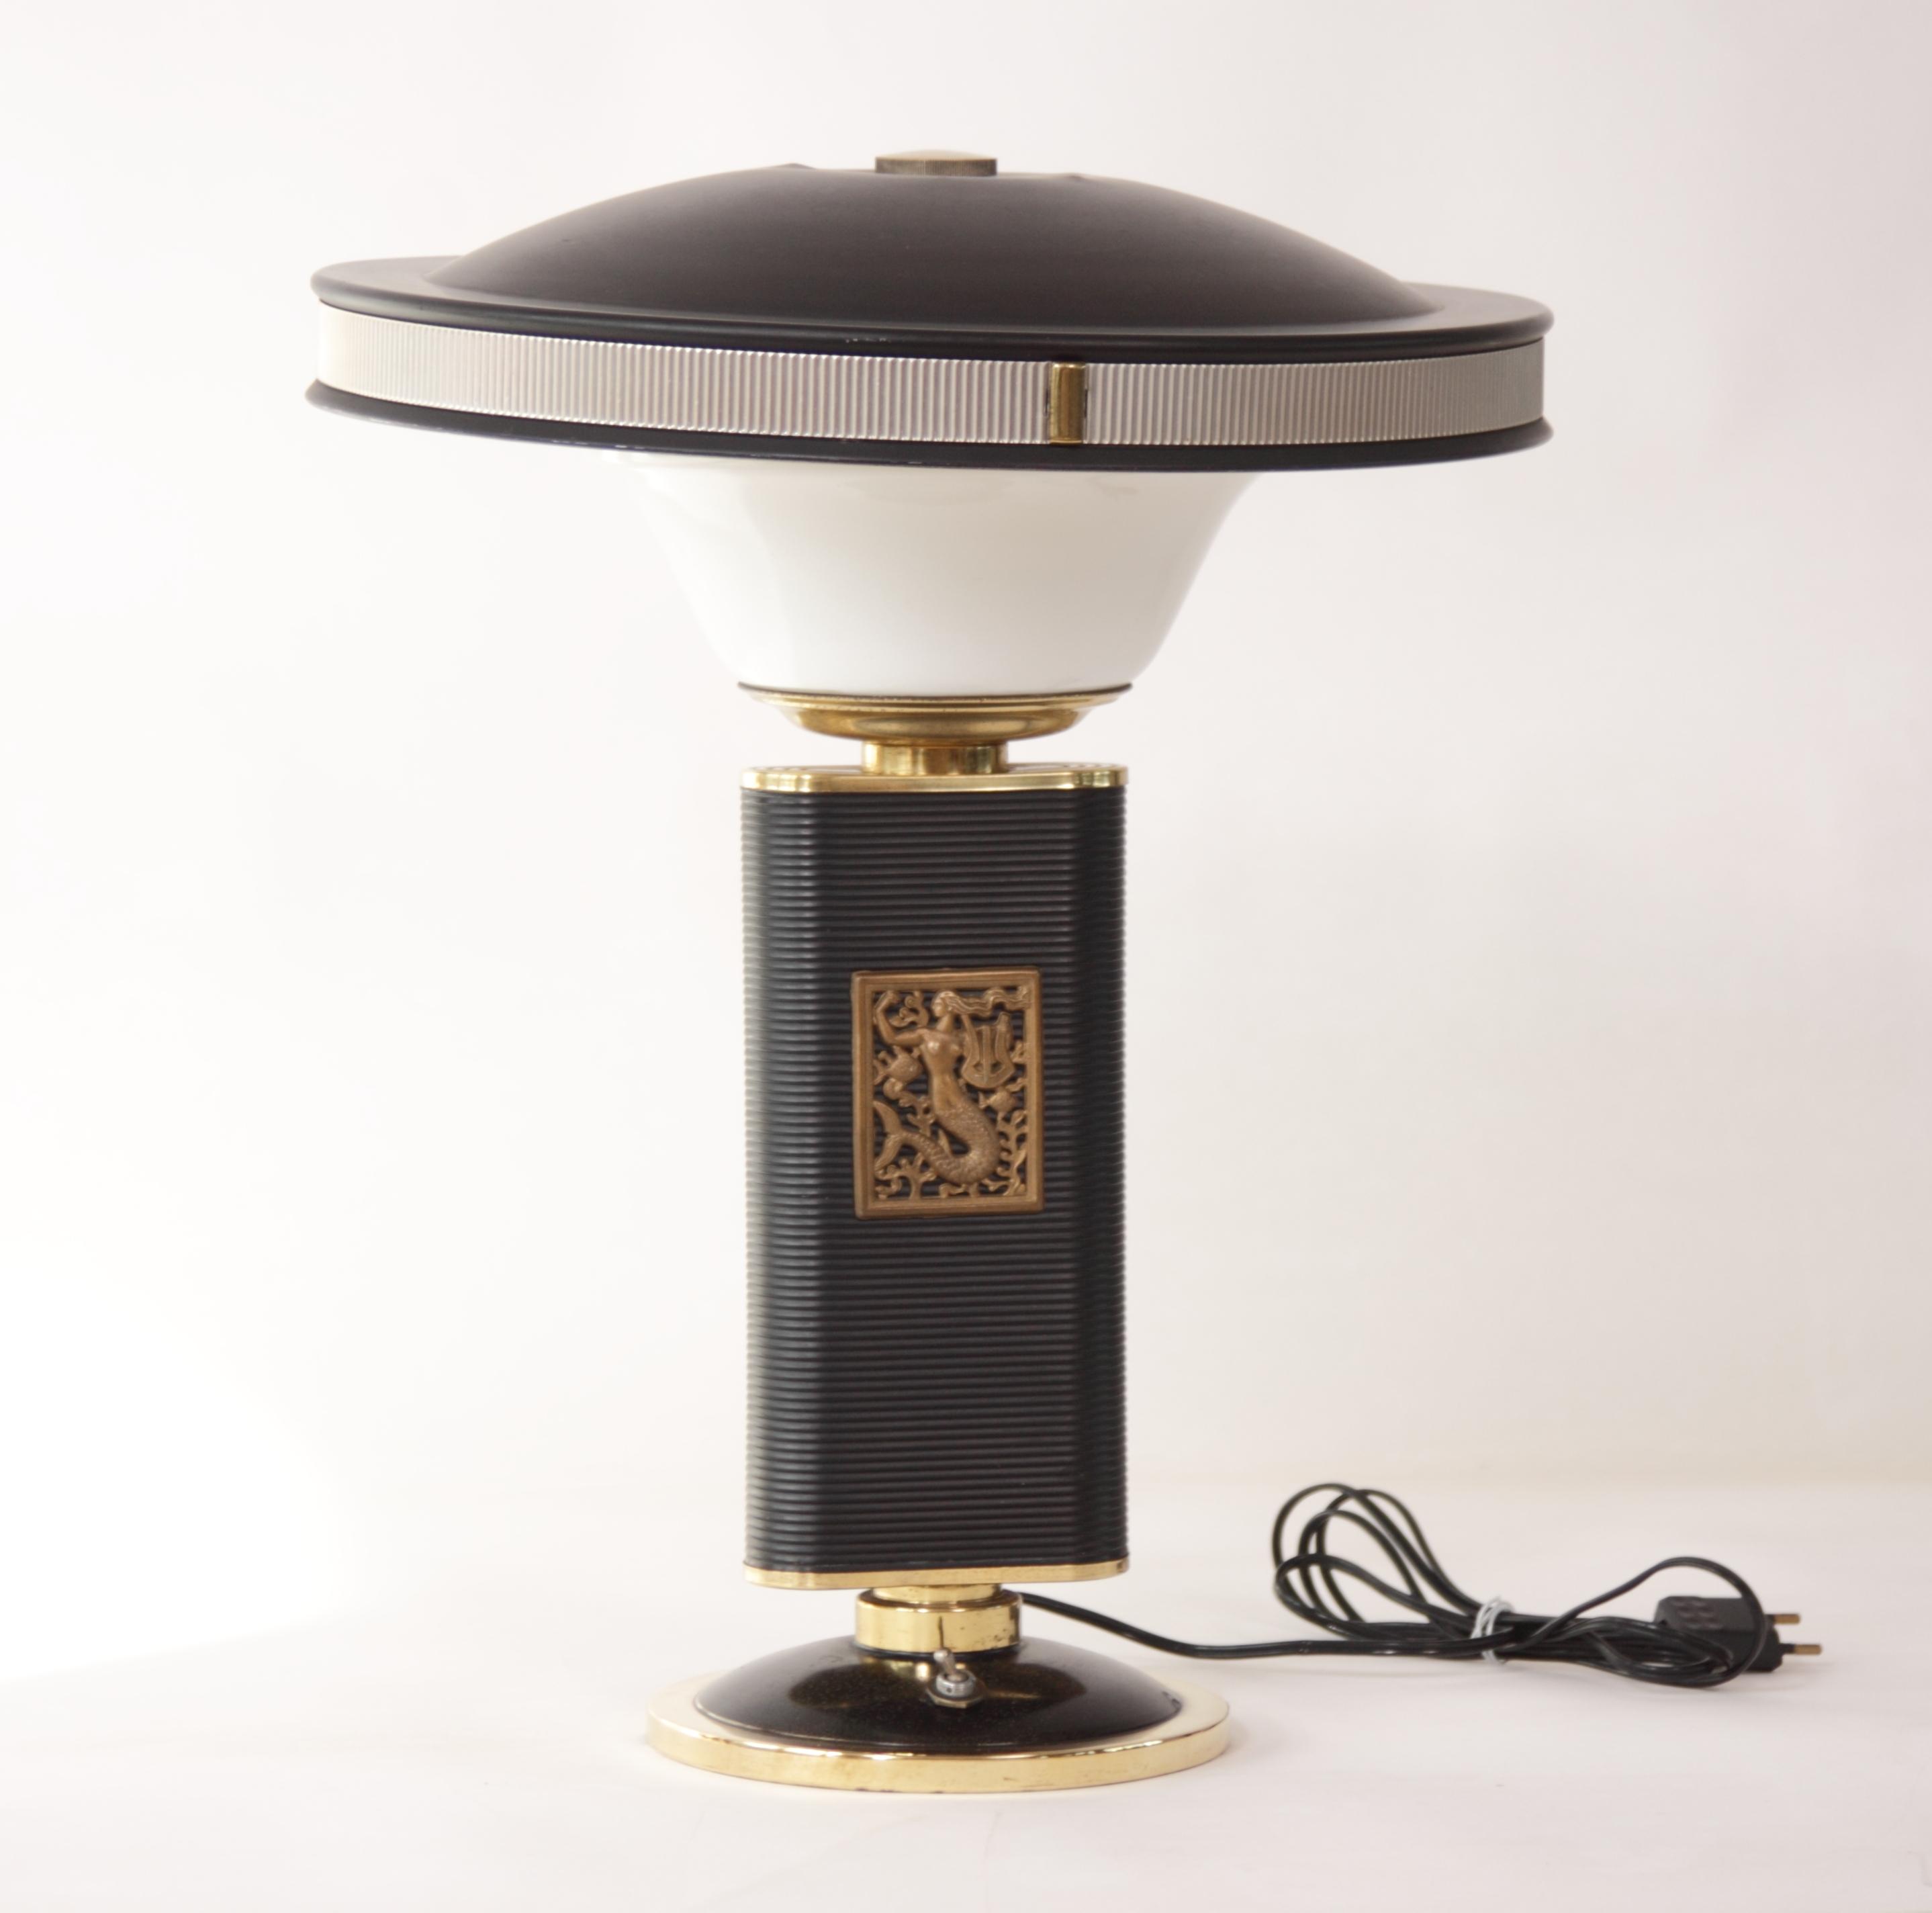 eileen gray lampe mermaid sirene f r jumo france strandholzshop vintage interior design. Black Bedroom Furniture Sets. Home Design Ideas